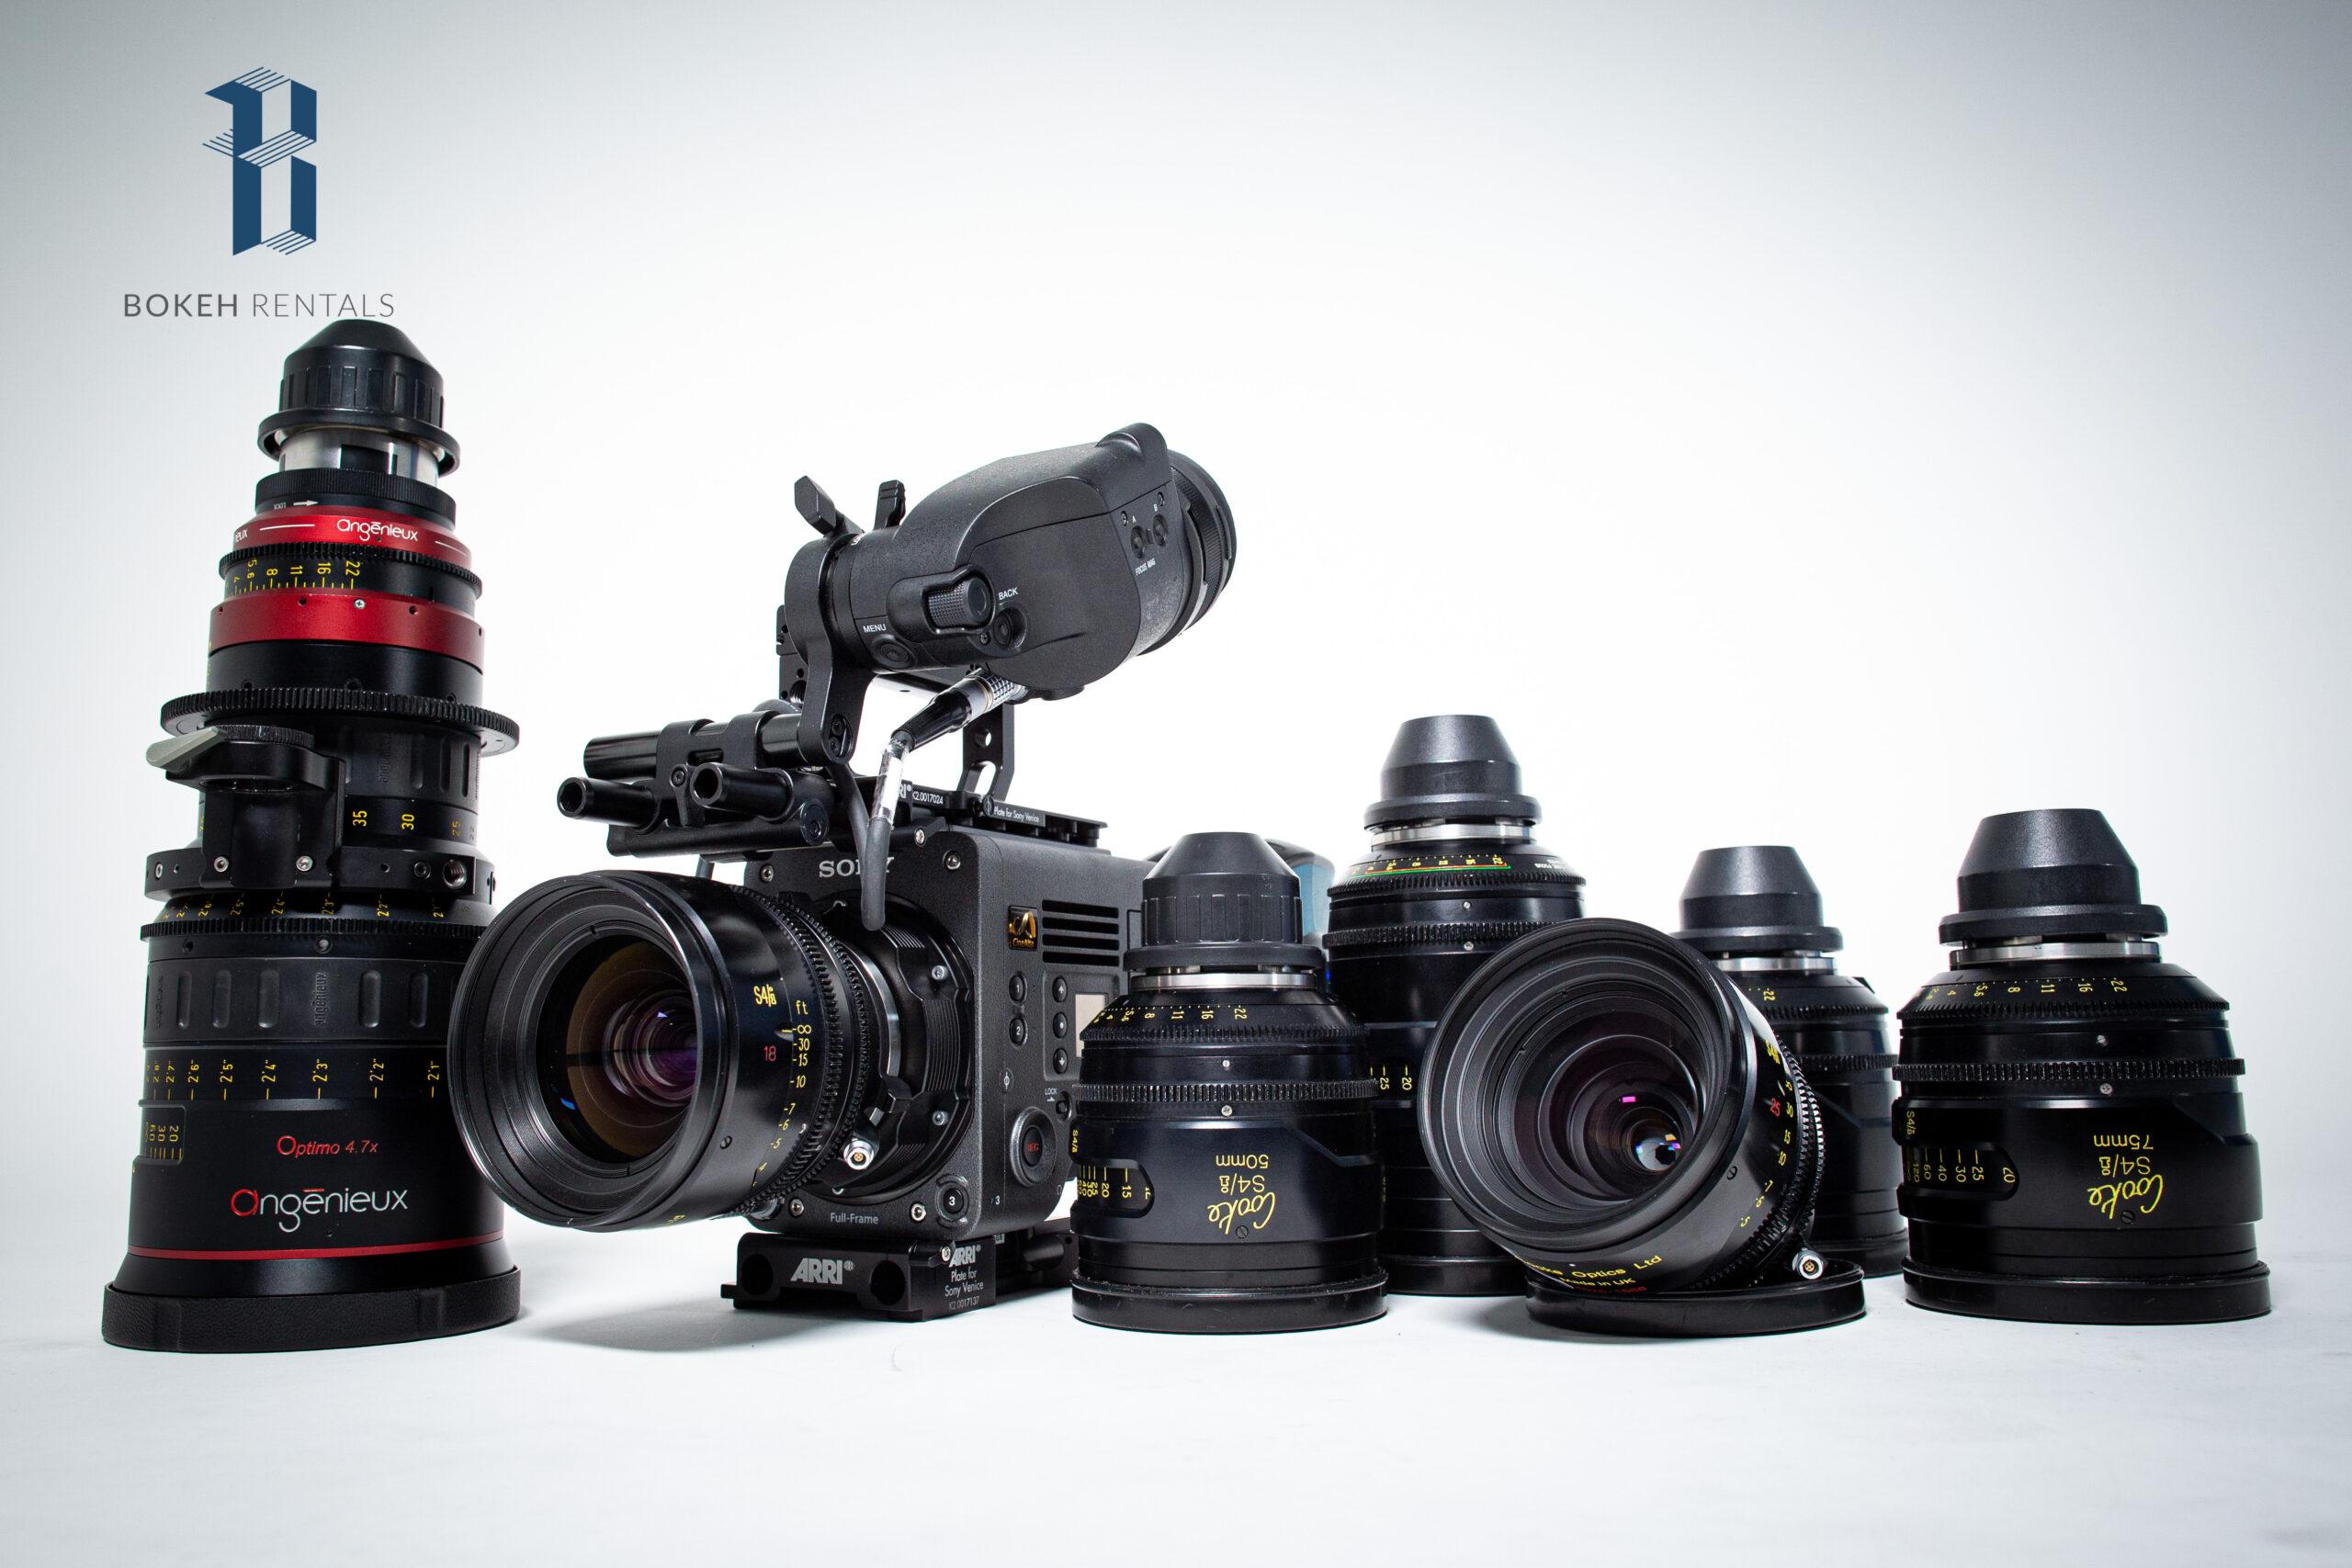 Sony Venice - Cooke S4/i & Angenieux 19.5-94mm Set